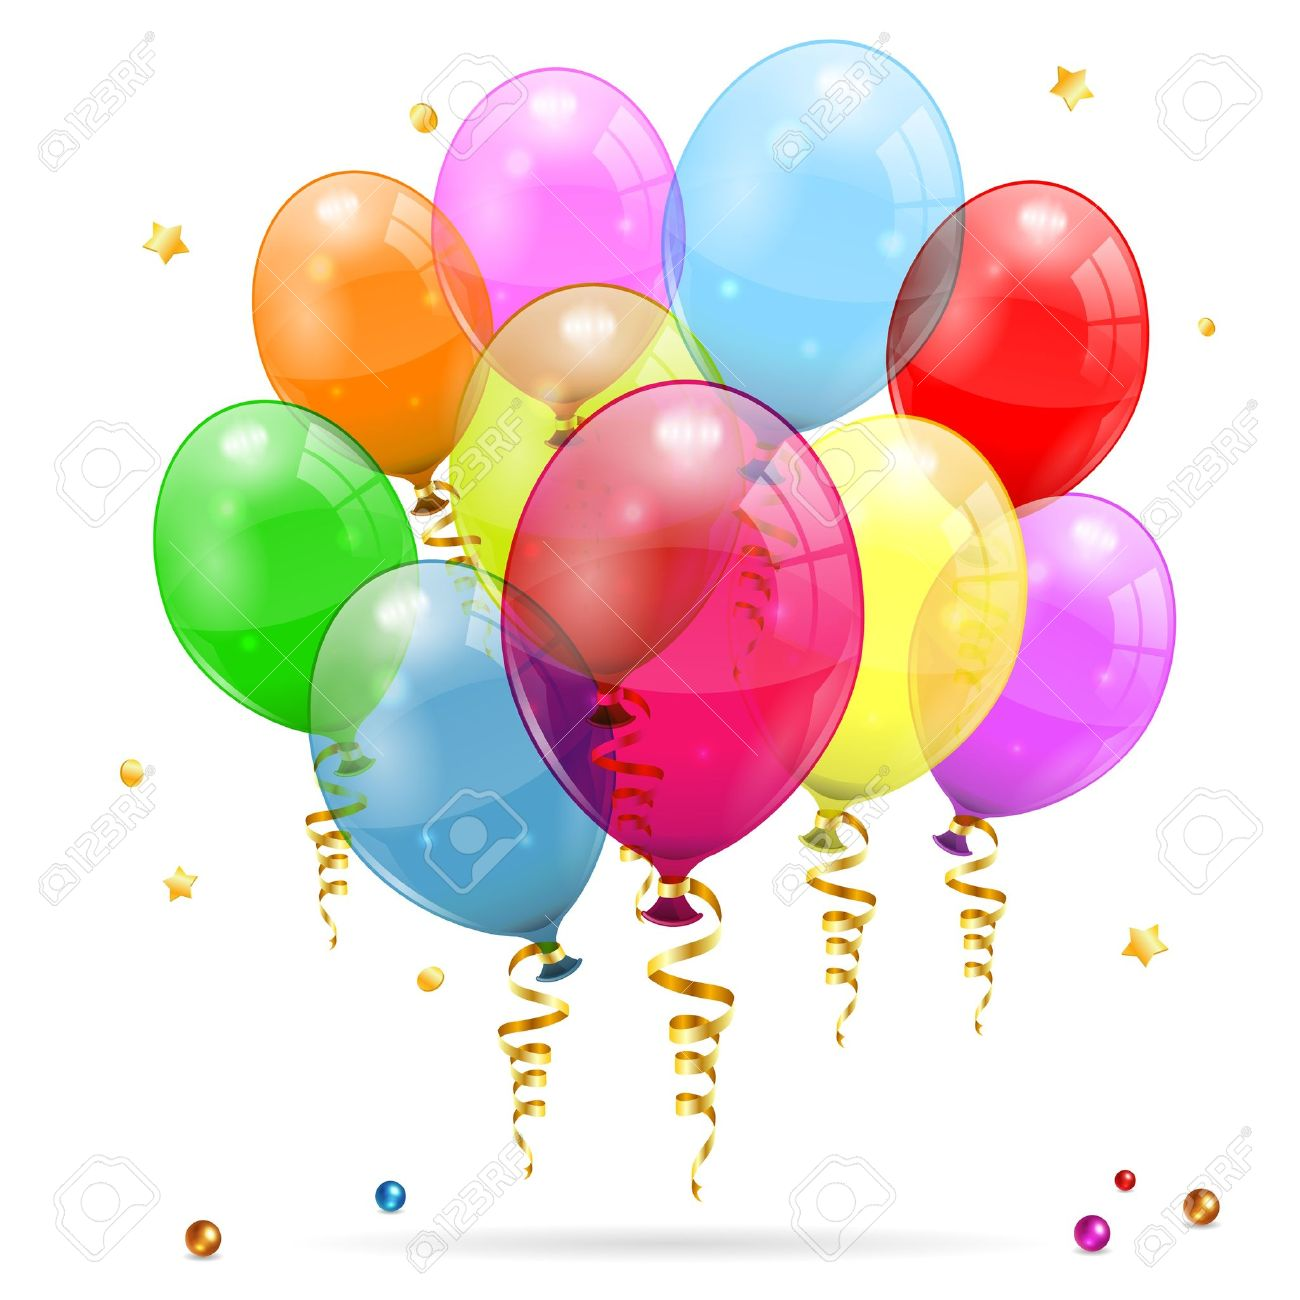 Clipart luftballon geburtstag png library 3D Transparent Geburtstag Luftballons Mit Streamer, Isoliert Auf ... png library